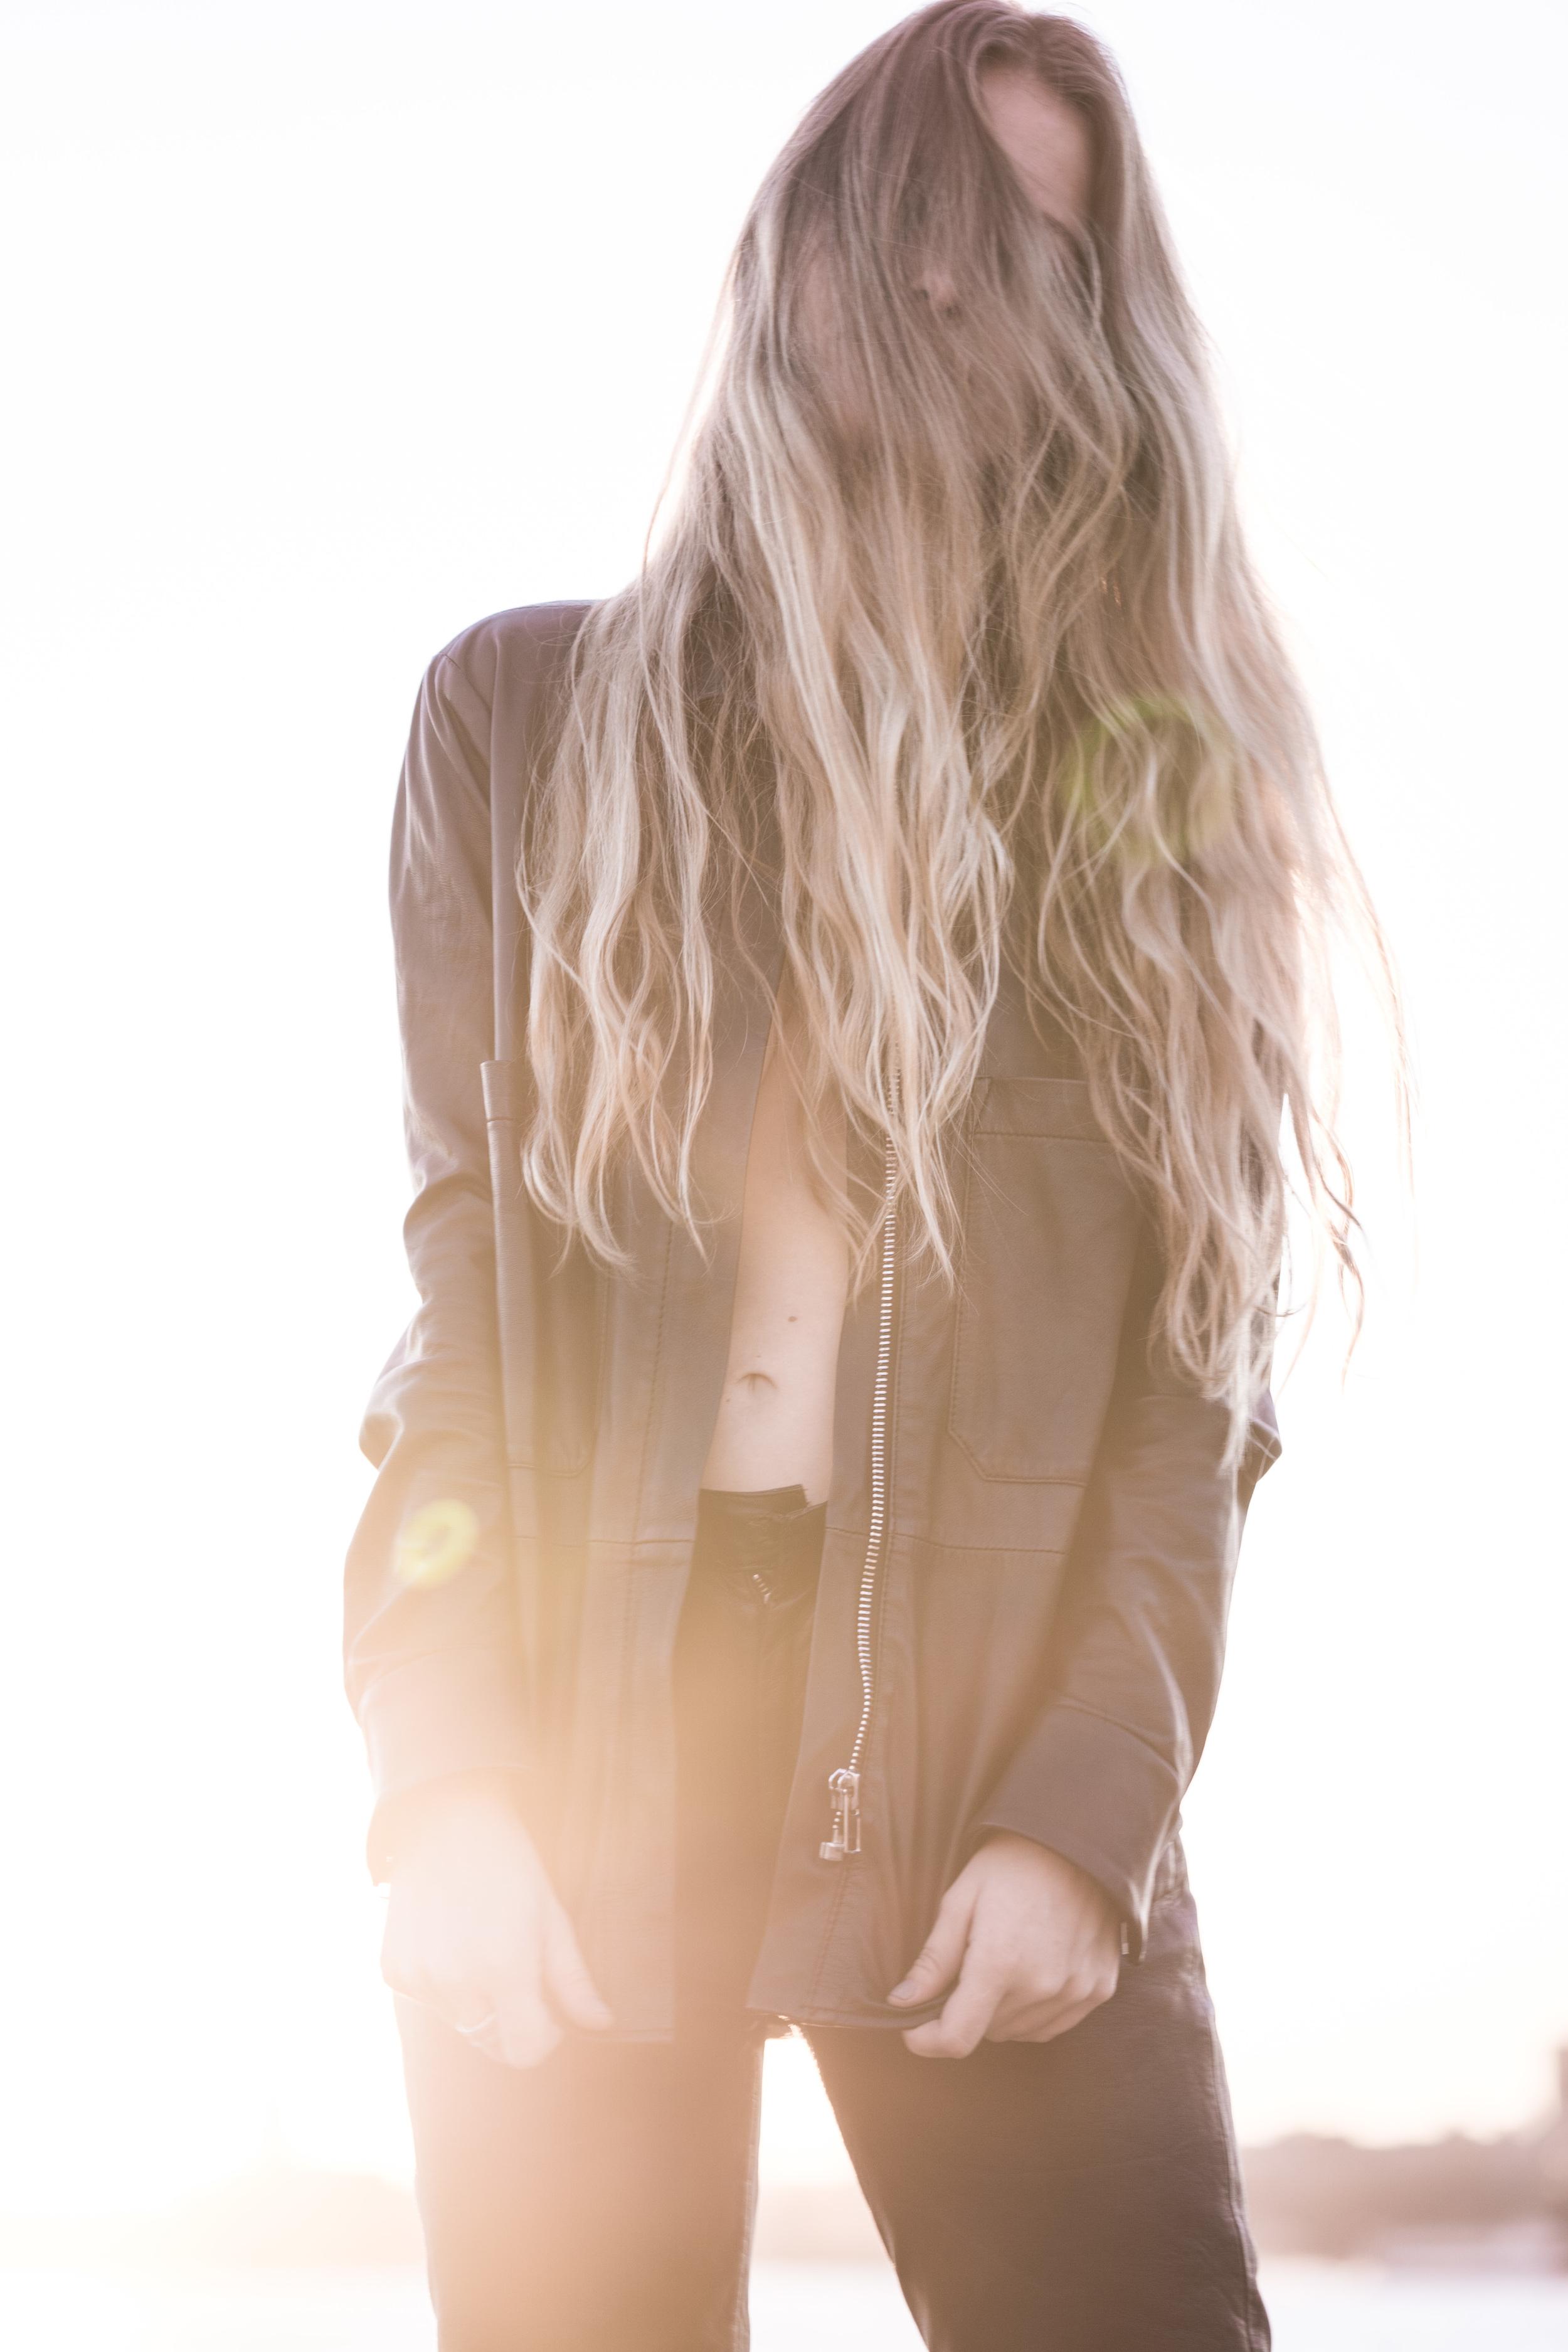 Pamela Leather-6.jpg